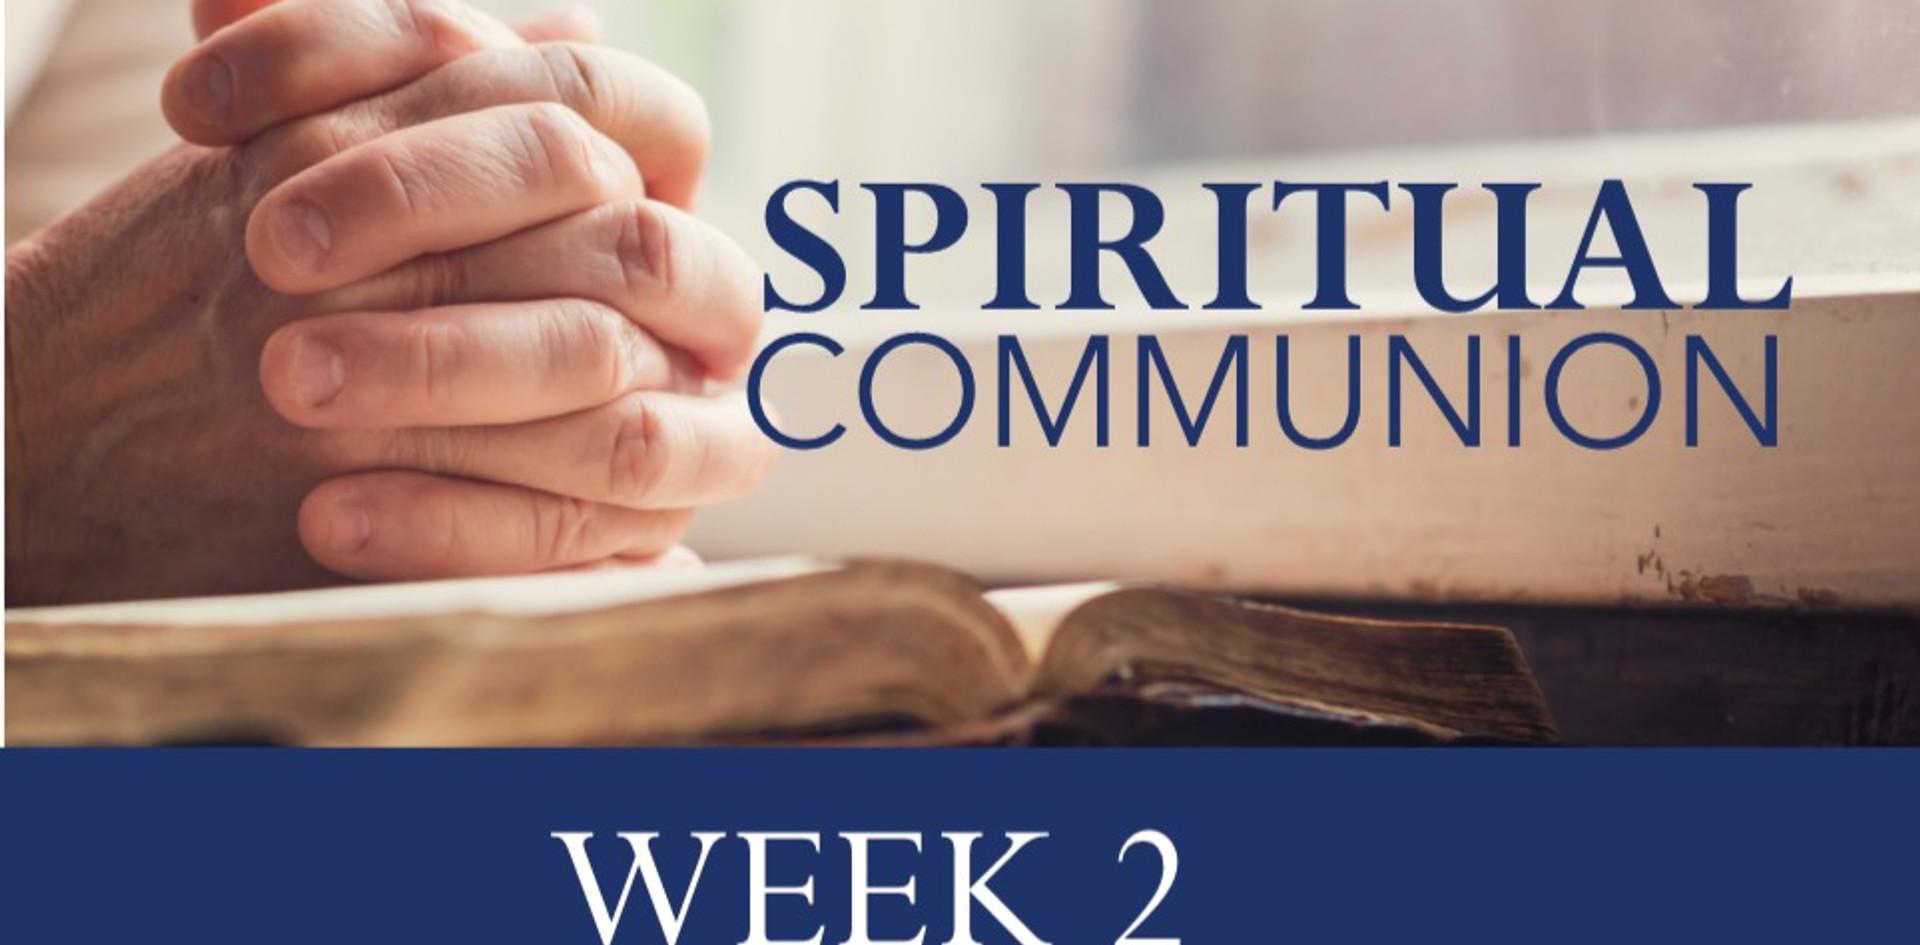 Spiritual Communion: Week 2